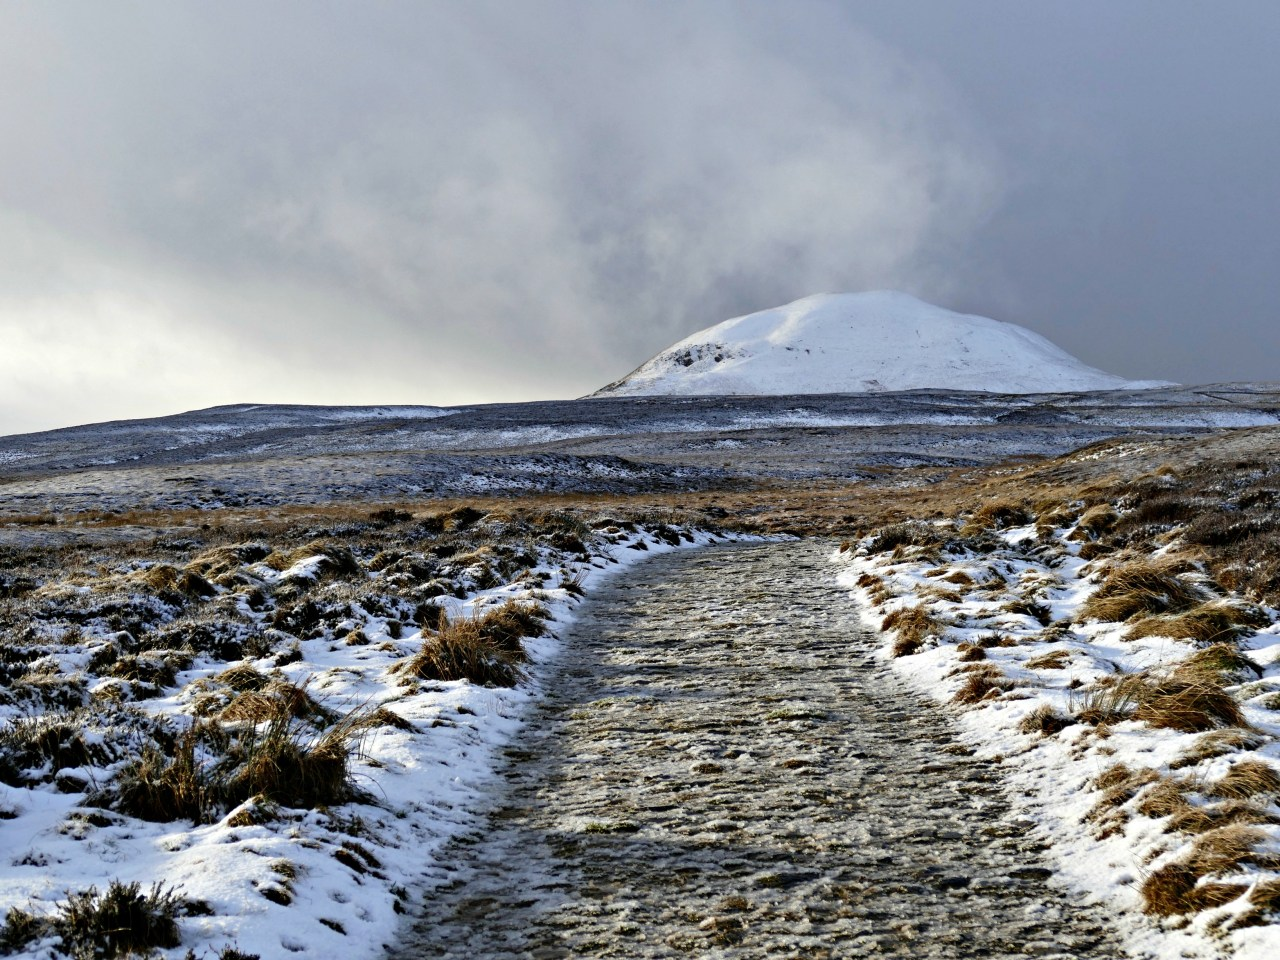 Walking in the wintry Pentland Hills, south Edinburgh. Image by Niki Fulton